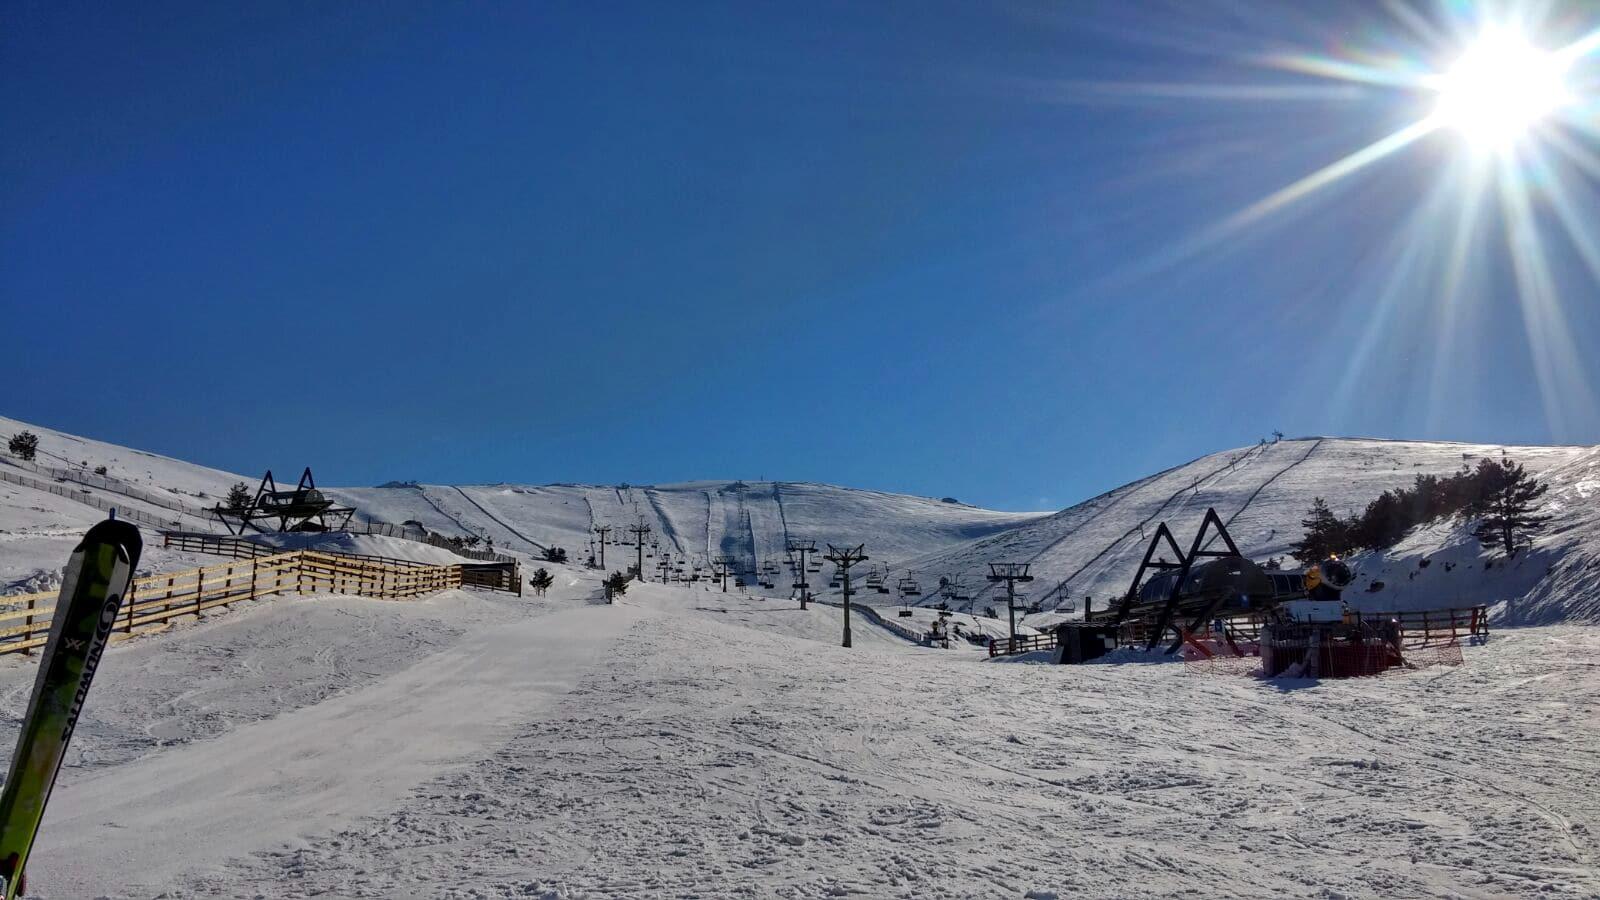 Club de snowboard Madrid Grupo Joven Valdesquí pistas